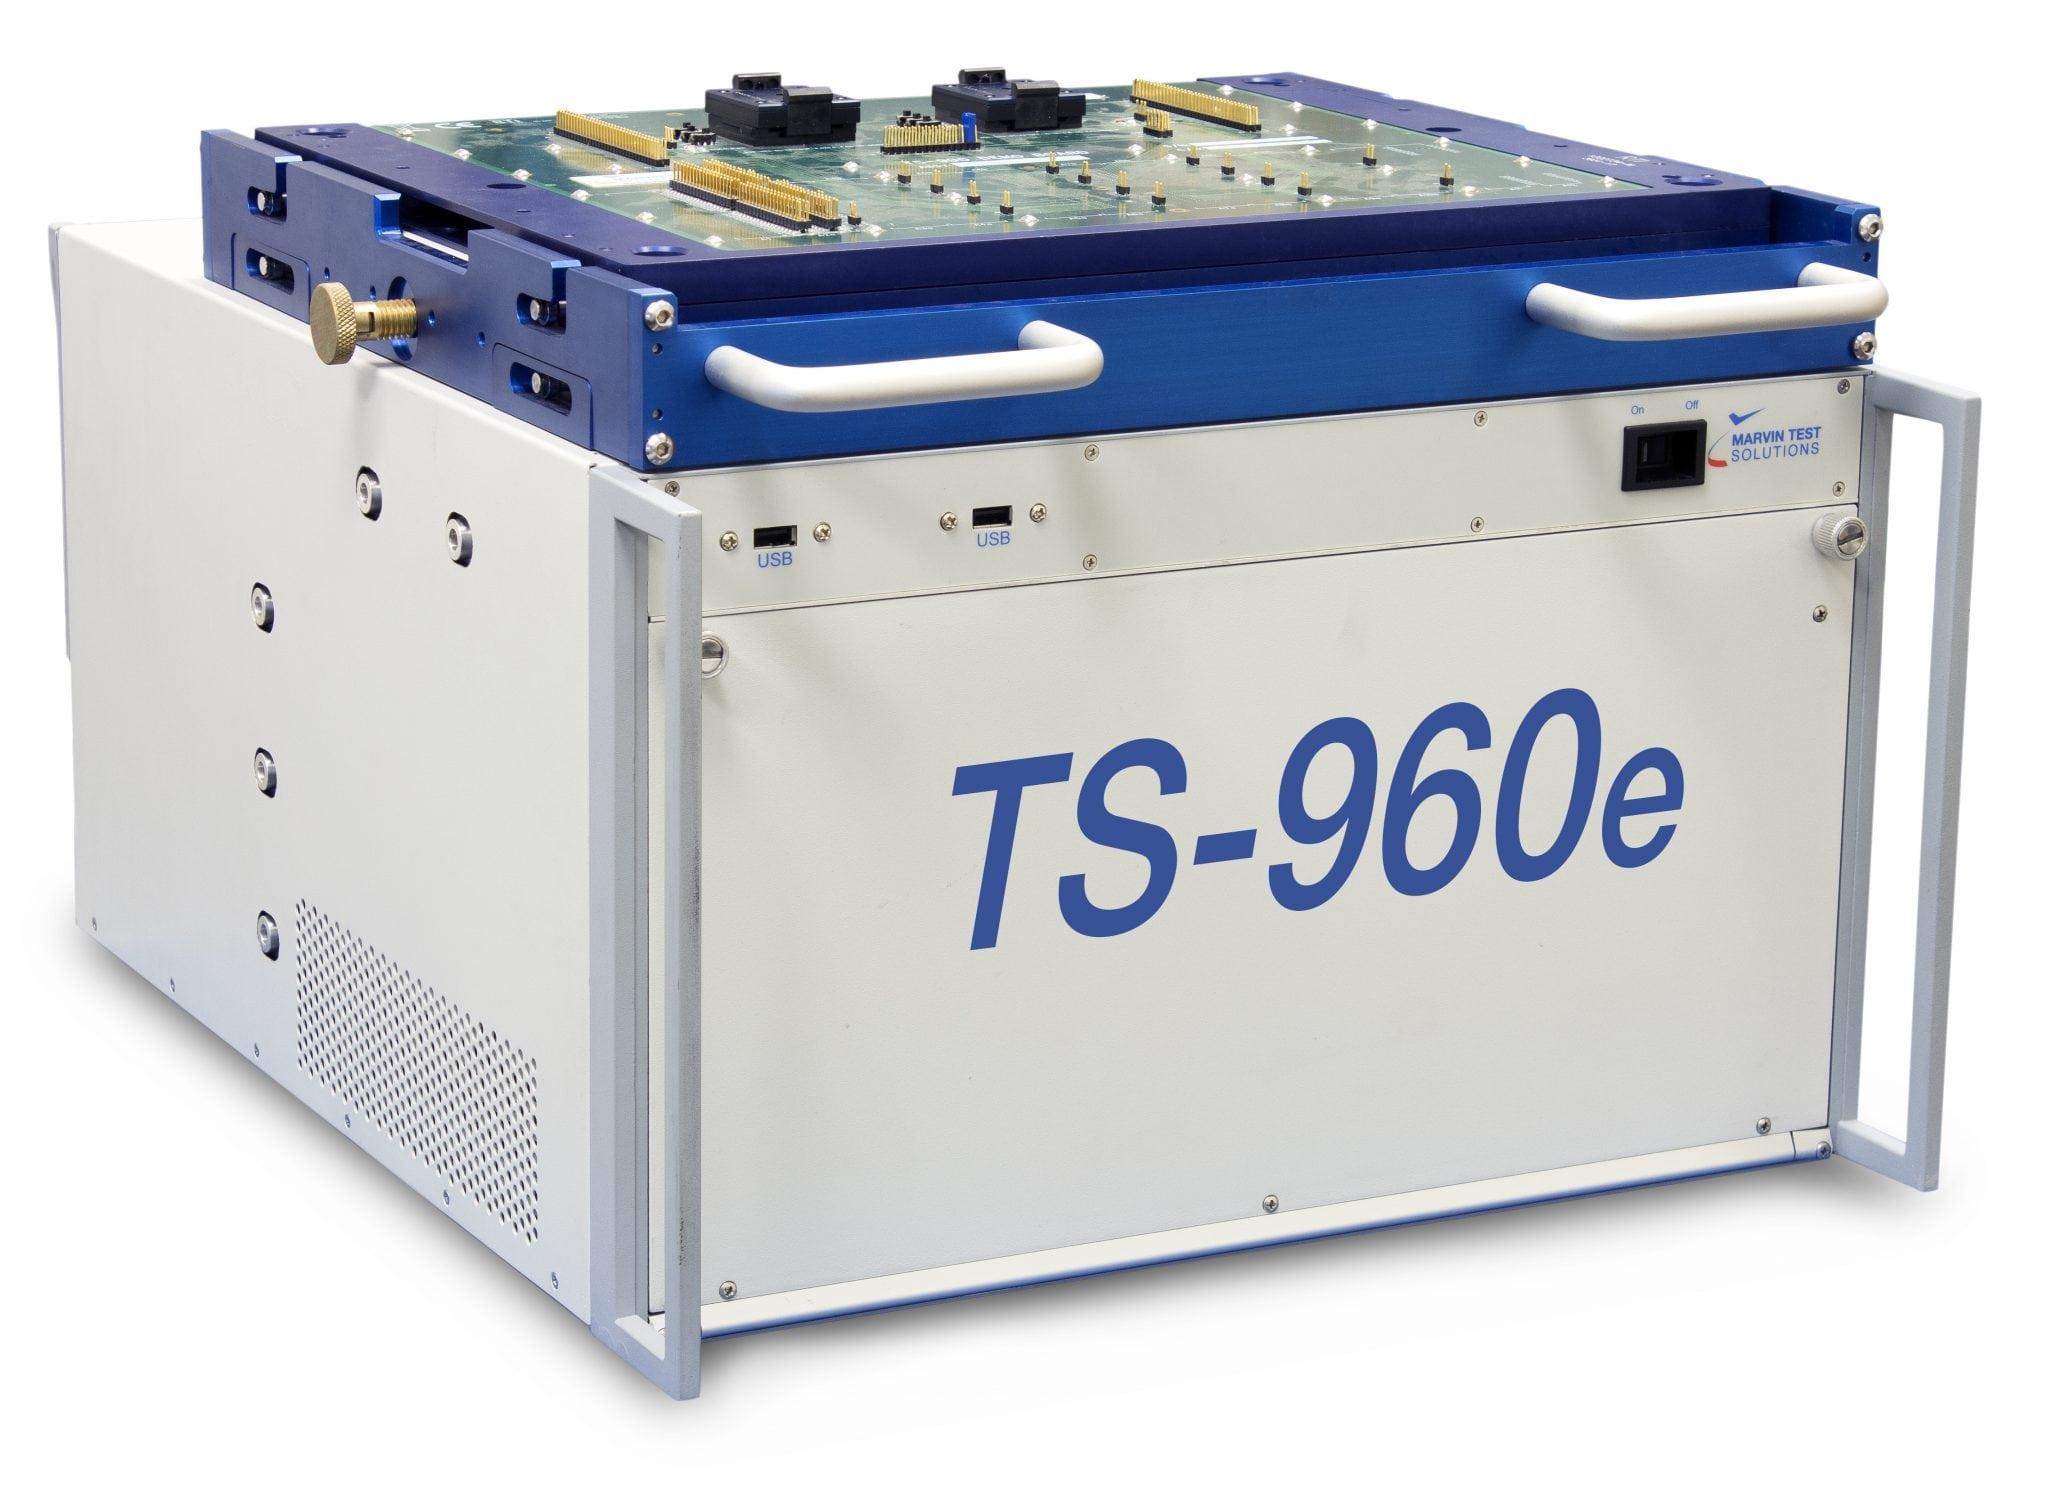 Marvin's TS-960e test platform